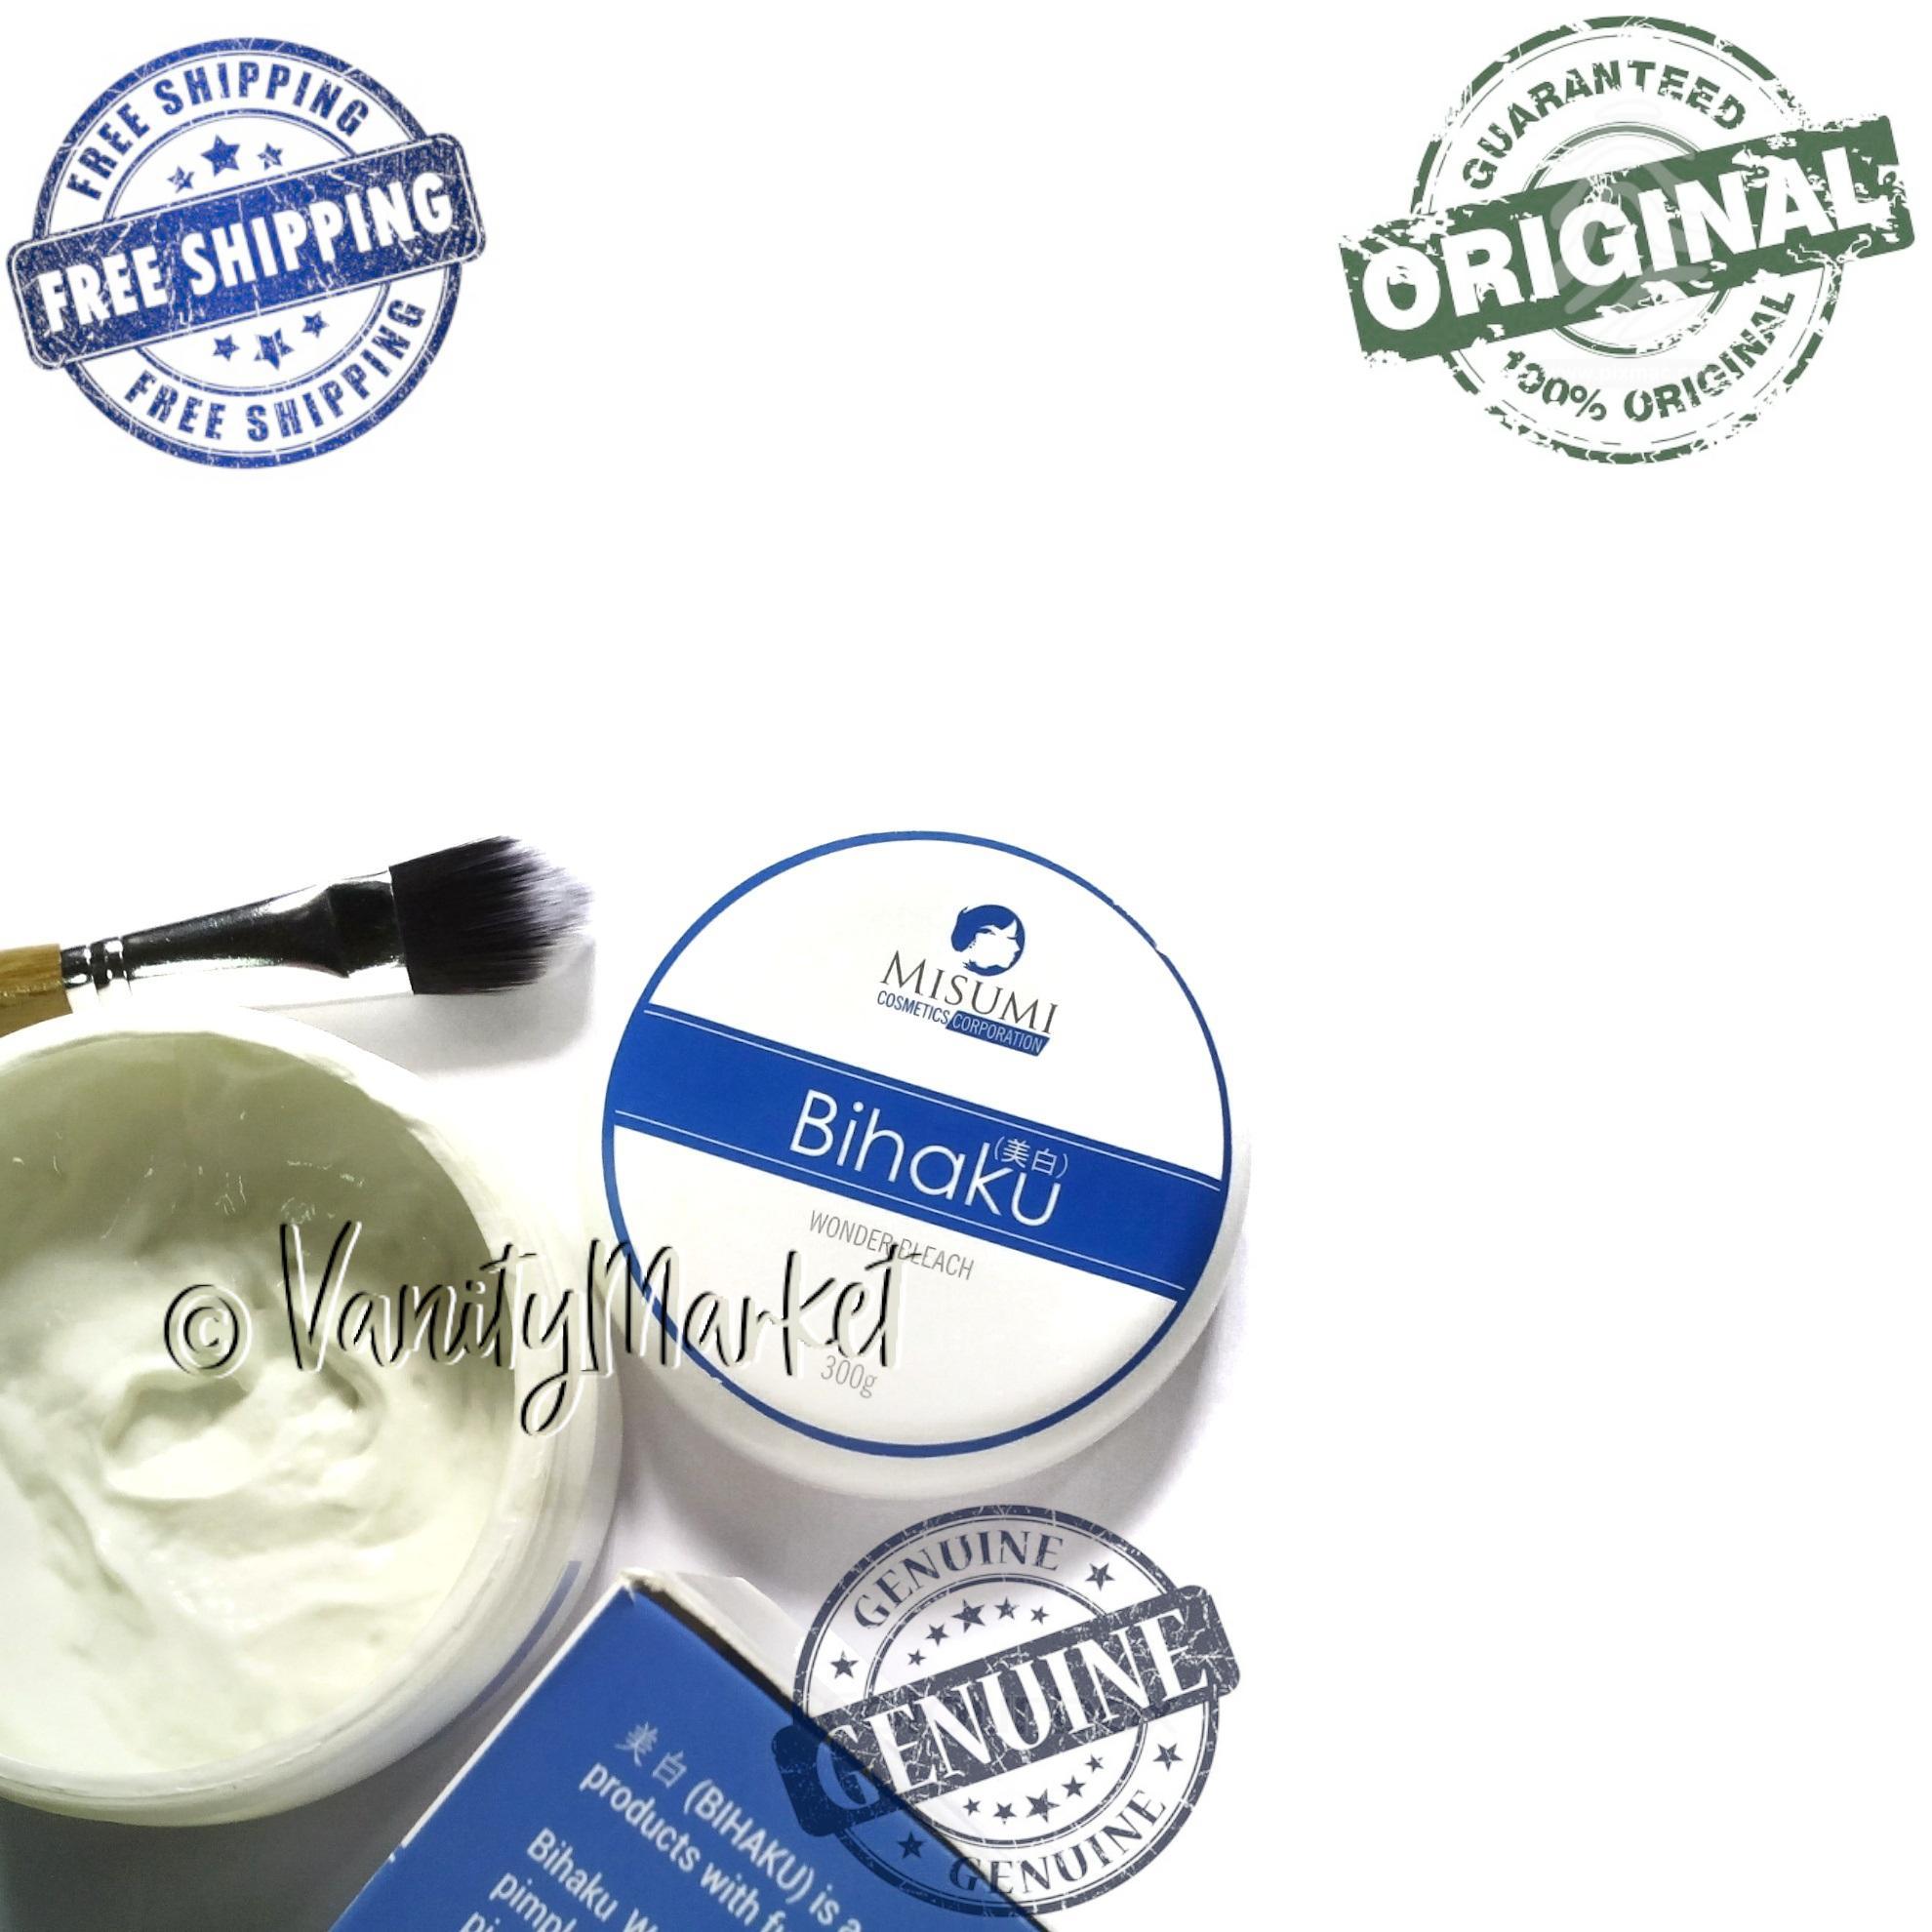 Misumi Bihaku Wonder Bleach (bleaching Cream For All Skin Types) By Vanitymarket.